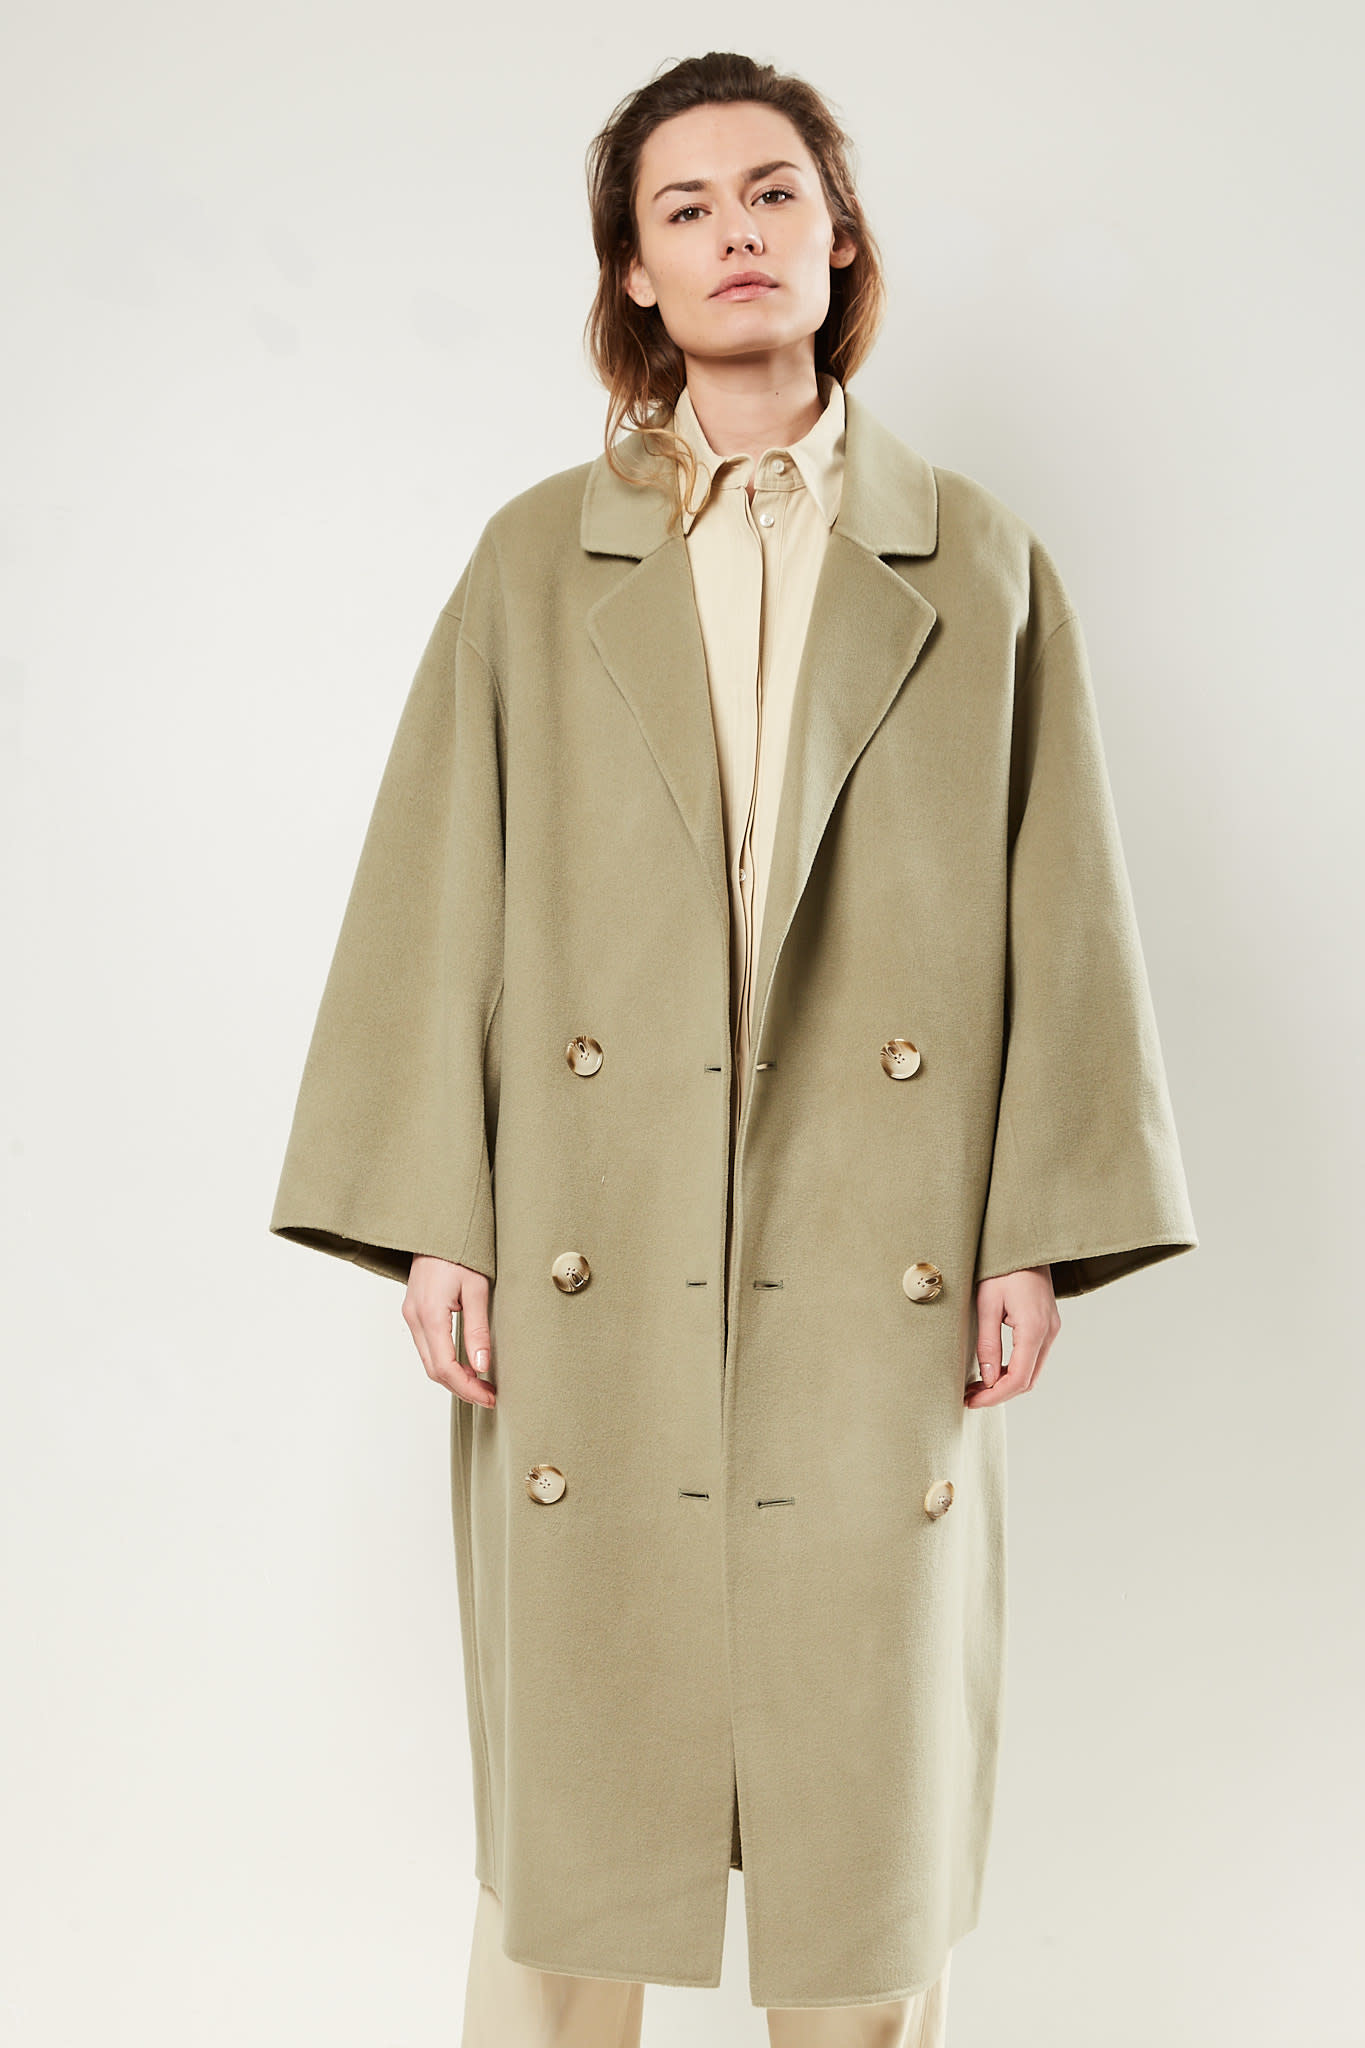 loulou studio - Borneo wool cashmere coat